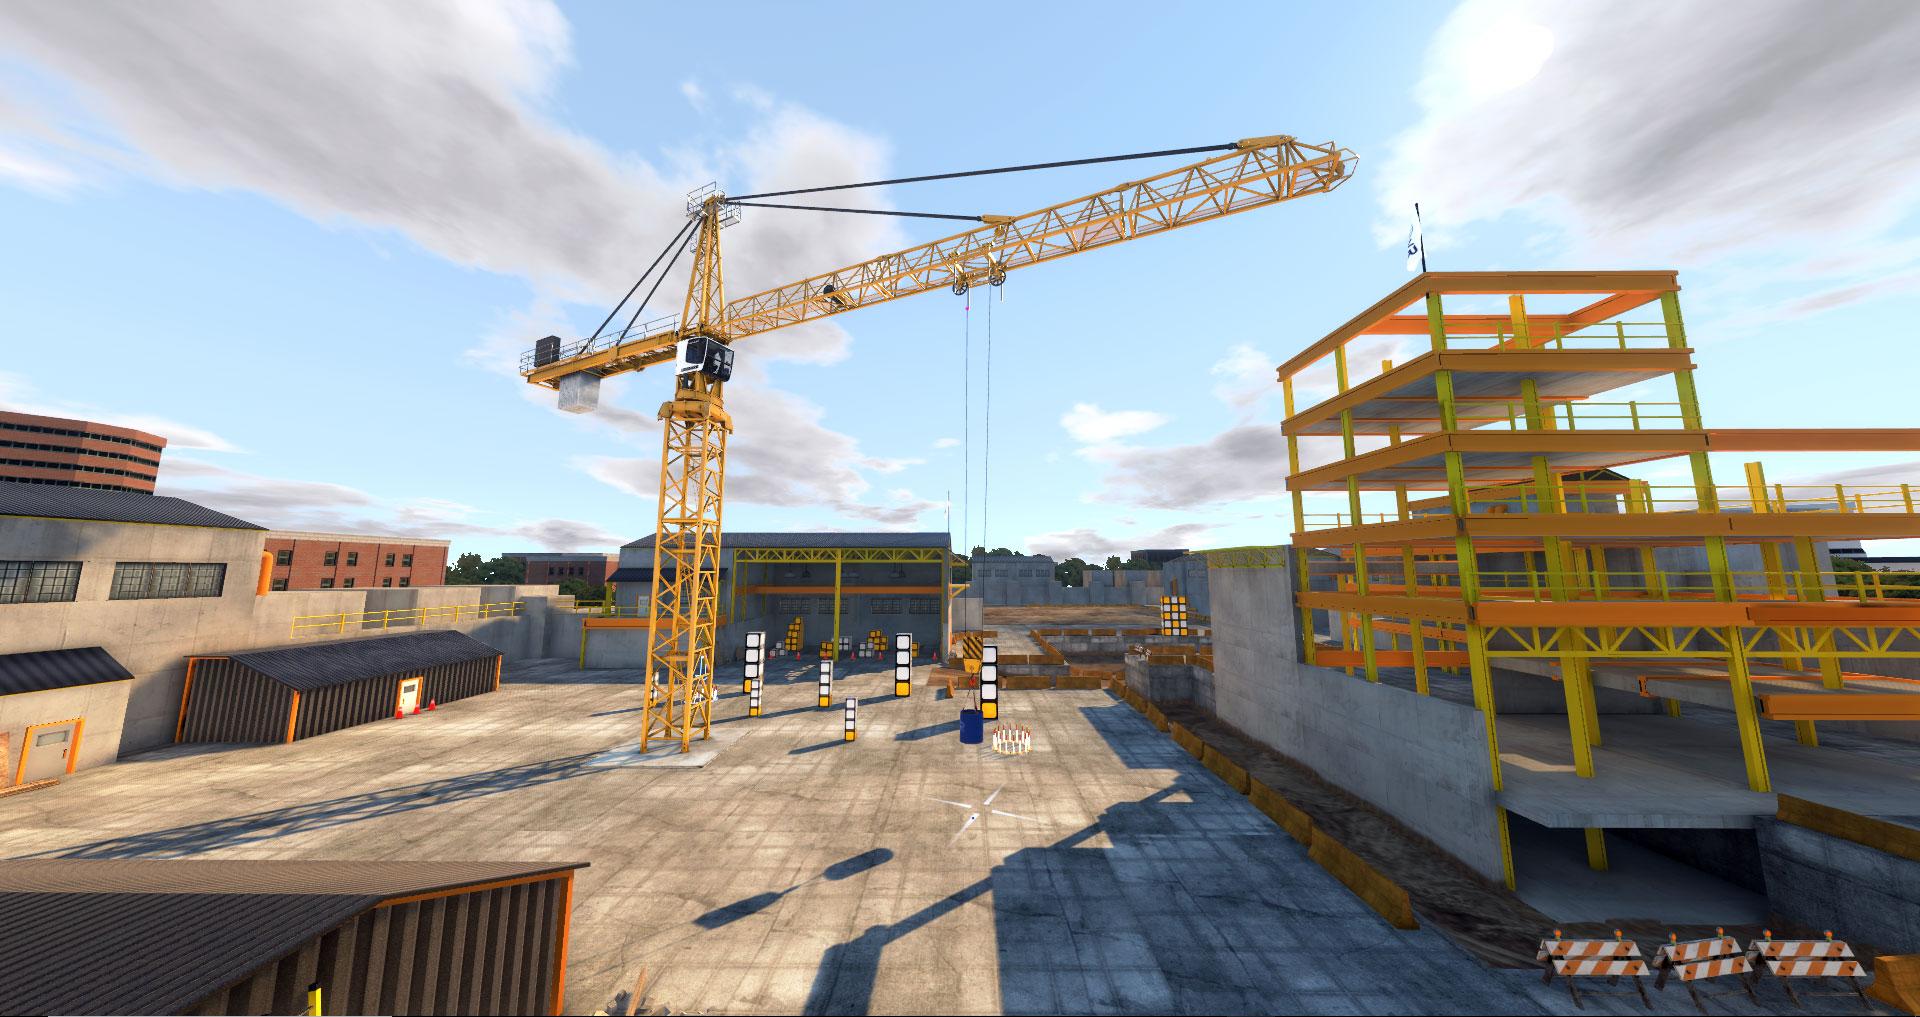 4e5bb6e4d8e1 VR-Tower-Crane-Slide-1280px-02-2